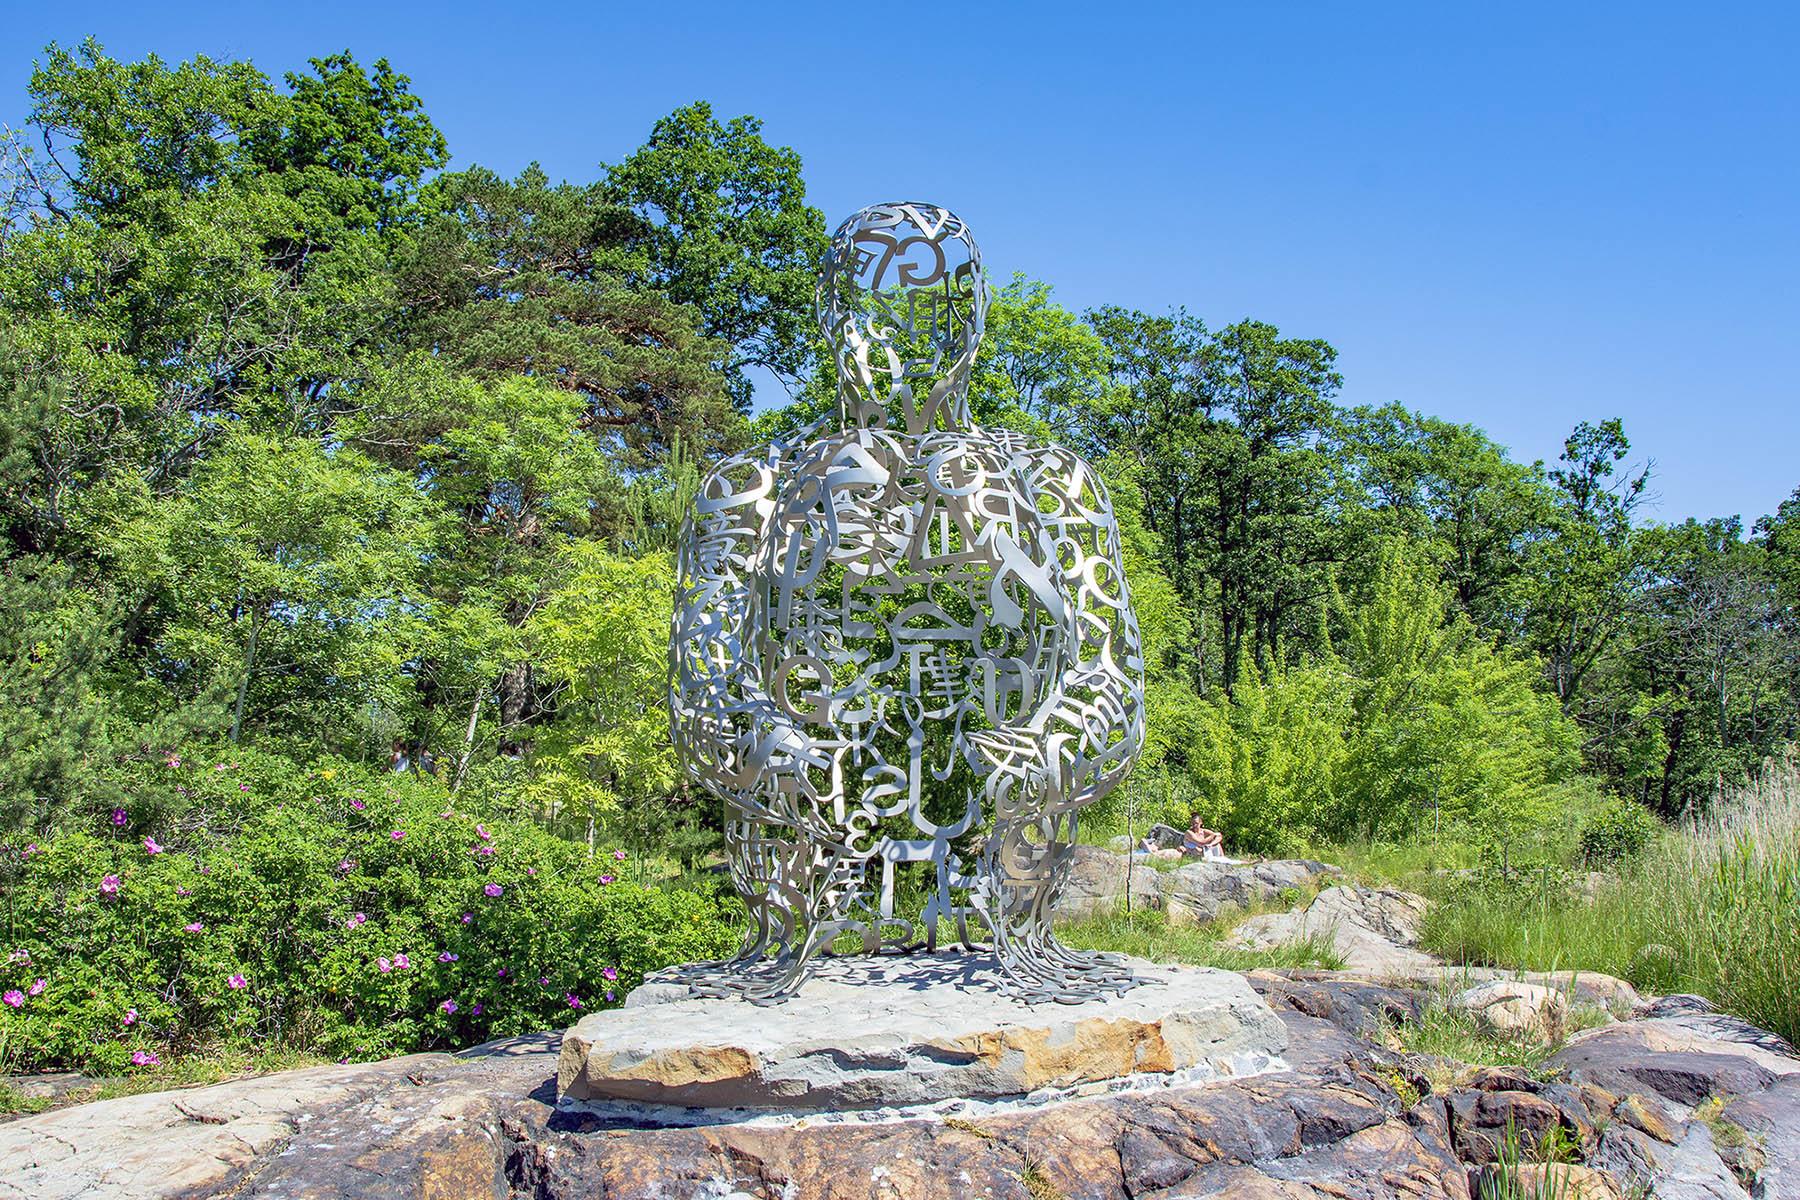 Jaume Plensa Artipelag Skulptur i natur